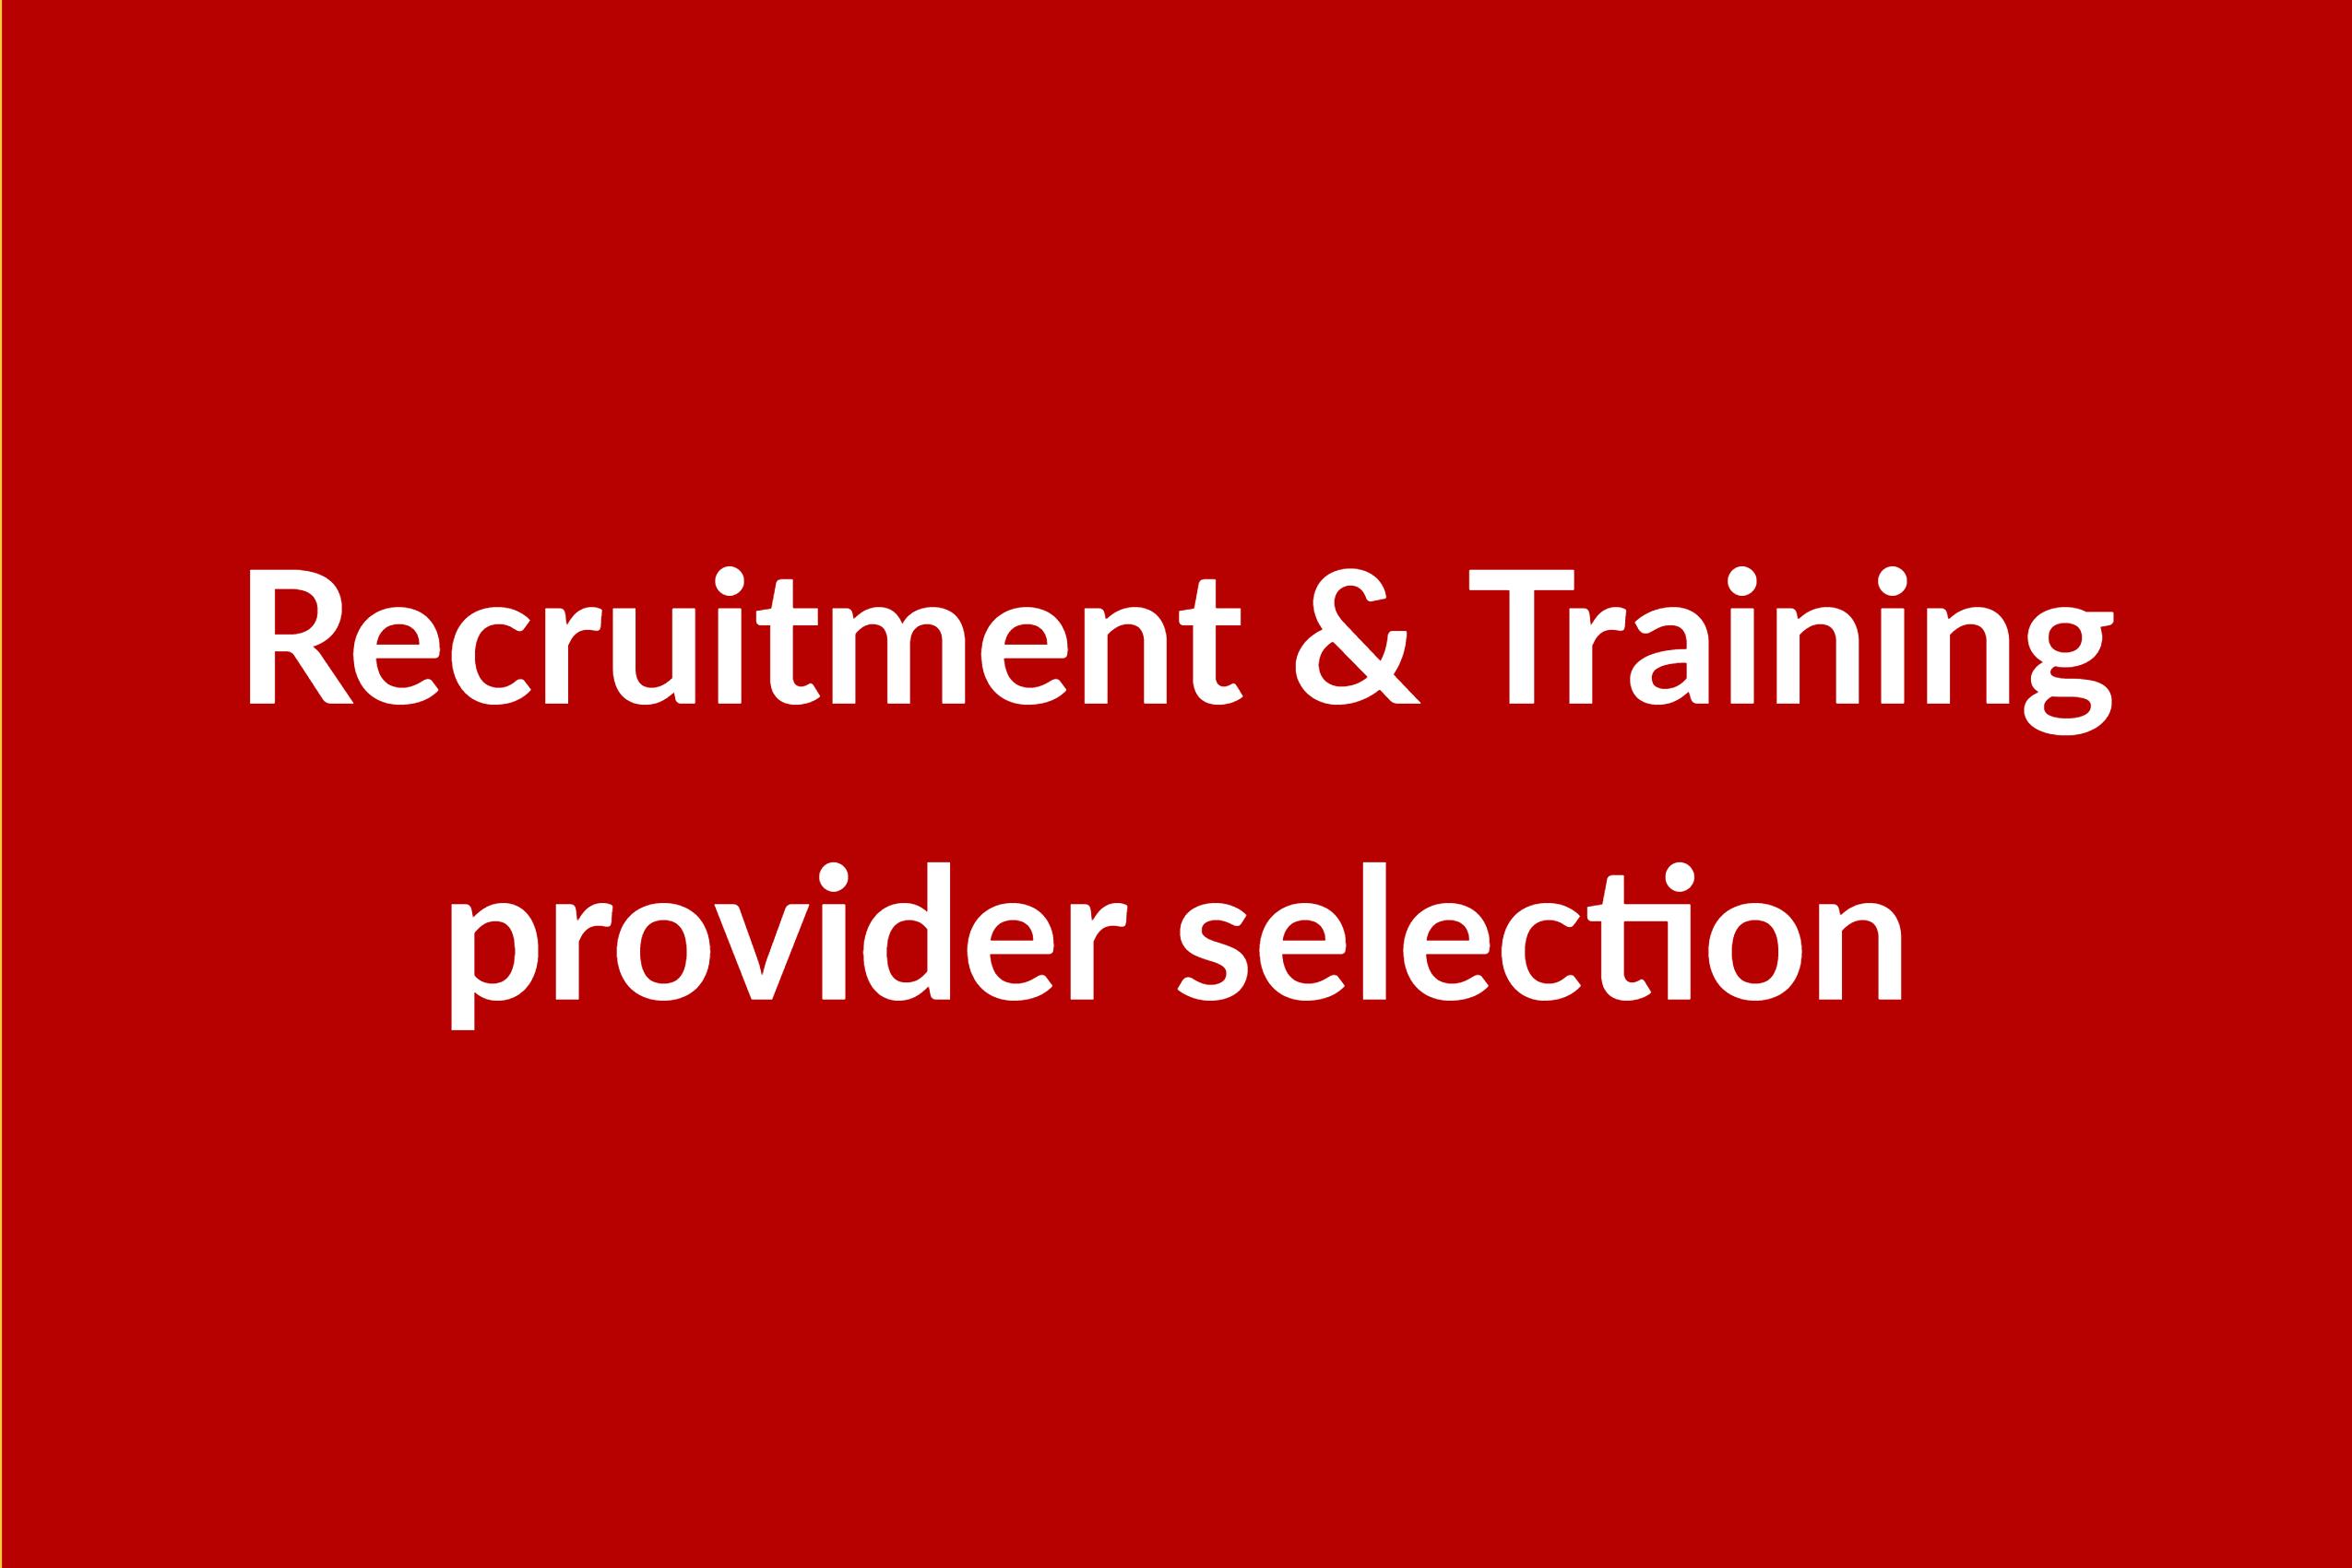 Recruitment & training selection